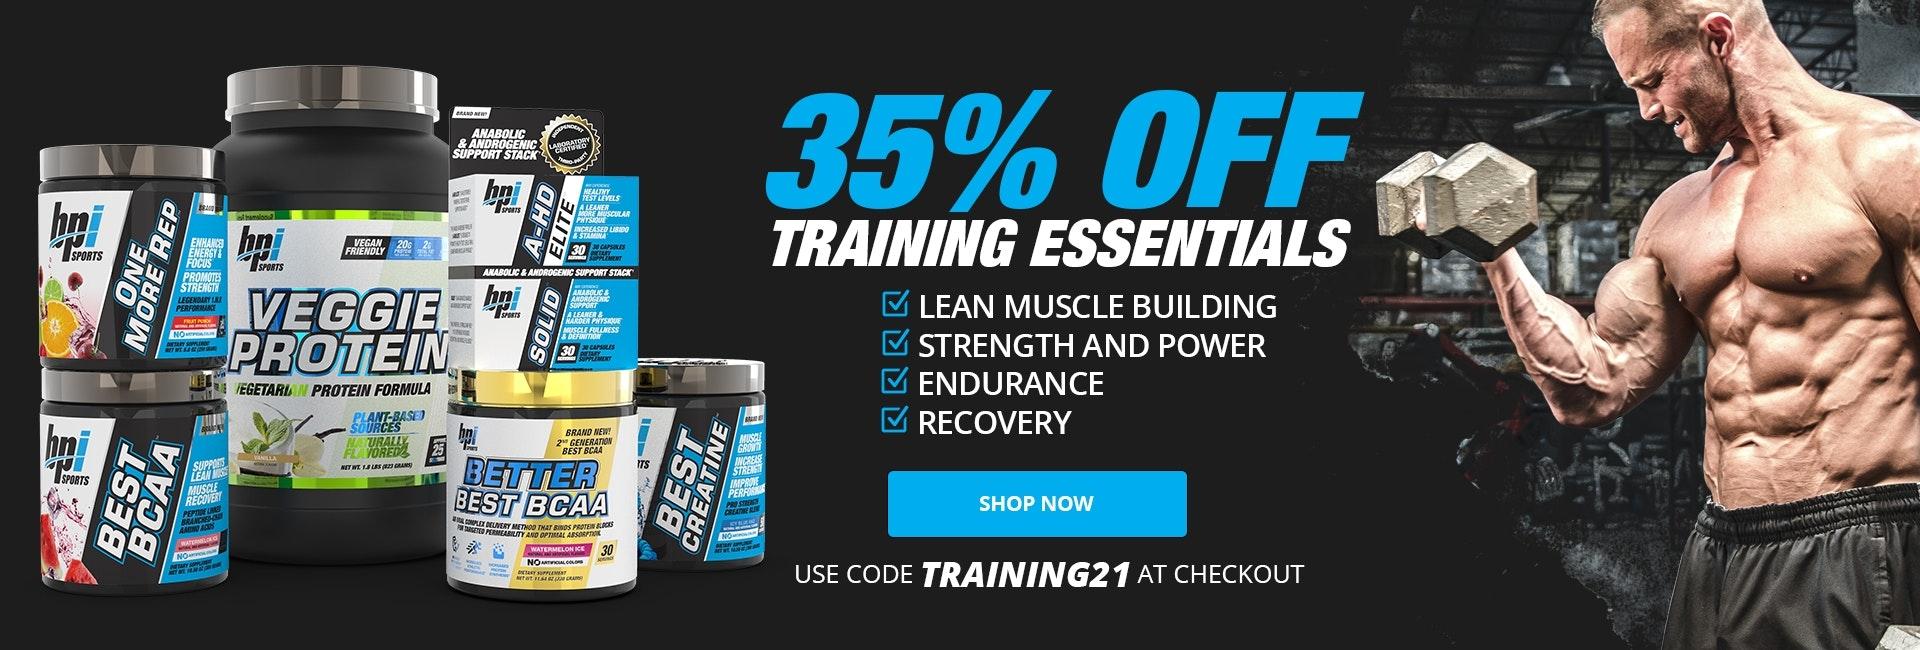 35 Off Training Essentials 1920 X650 HP DESK